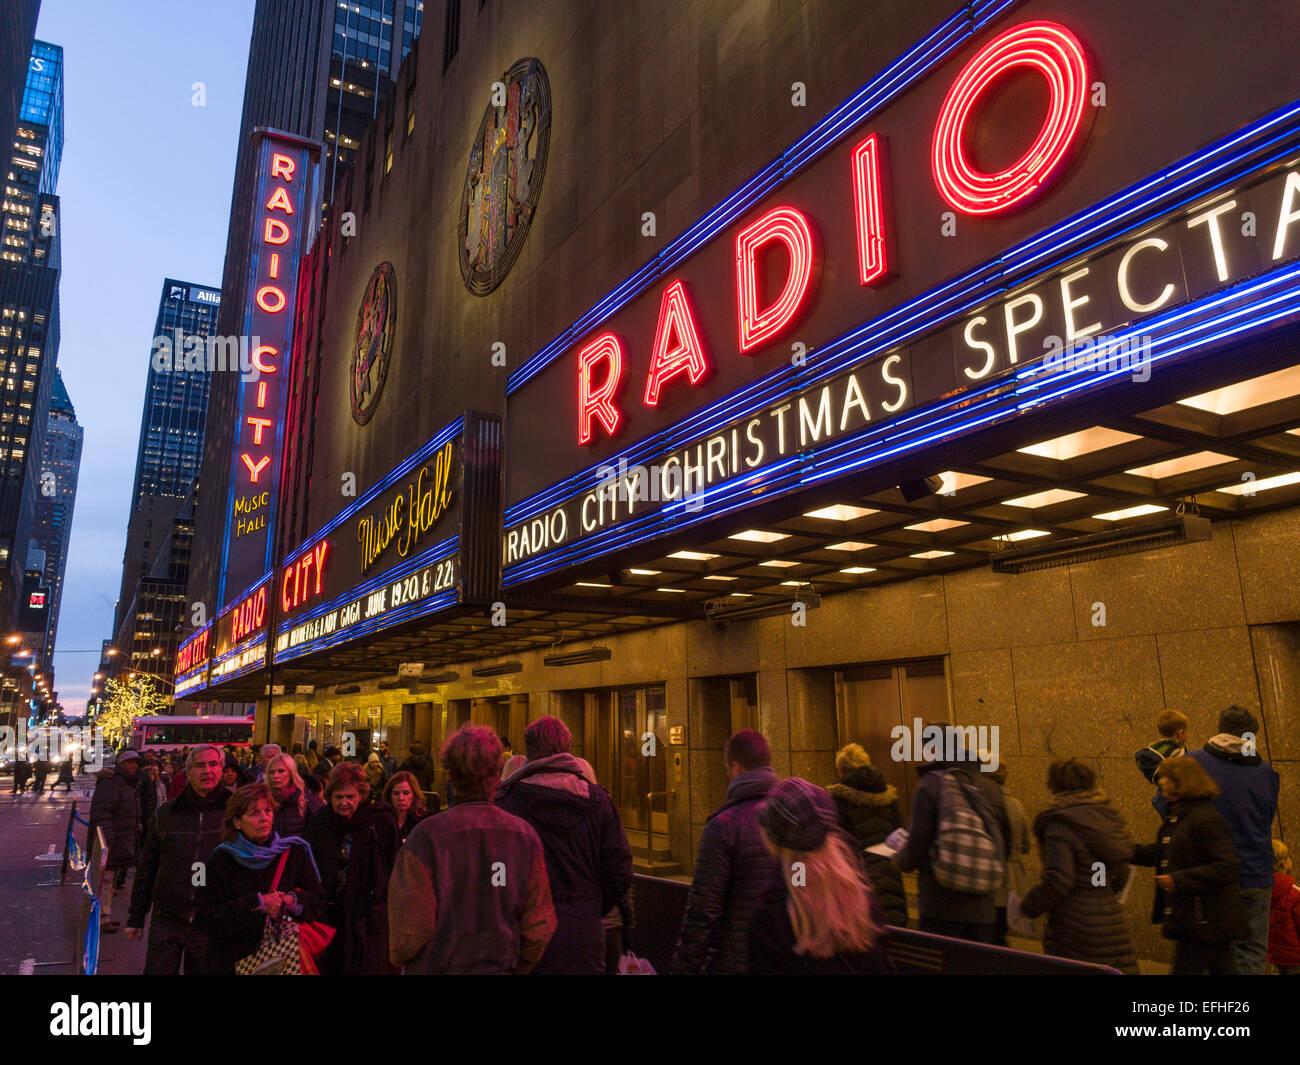 Futter für Radio City Music Hall Christmas Spectacular. Radio City ...